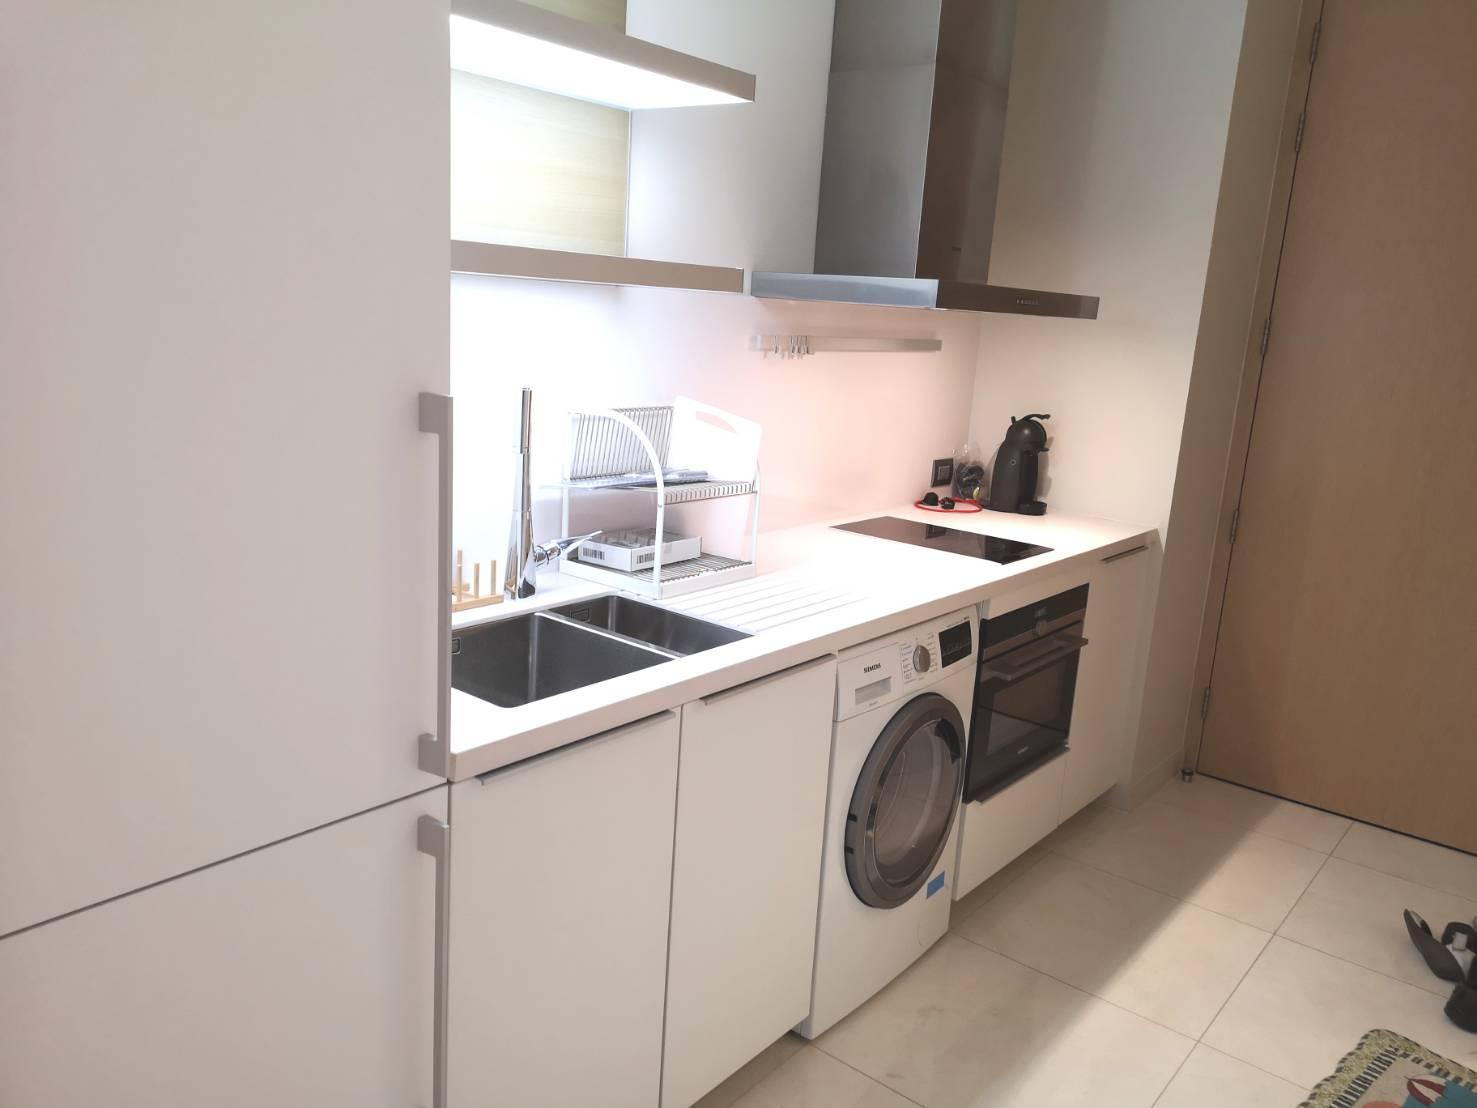 Bangkok Condo Apartment For Rent in Chidlom Sukhumvit Warm & Cozy